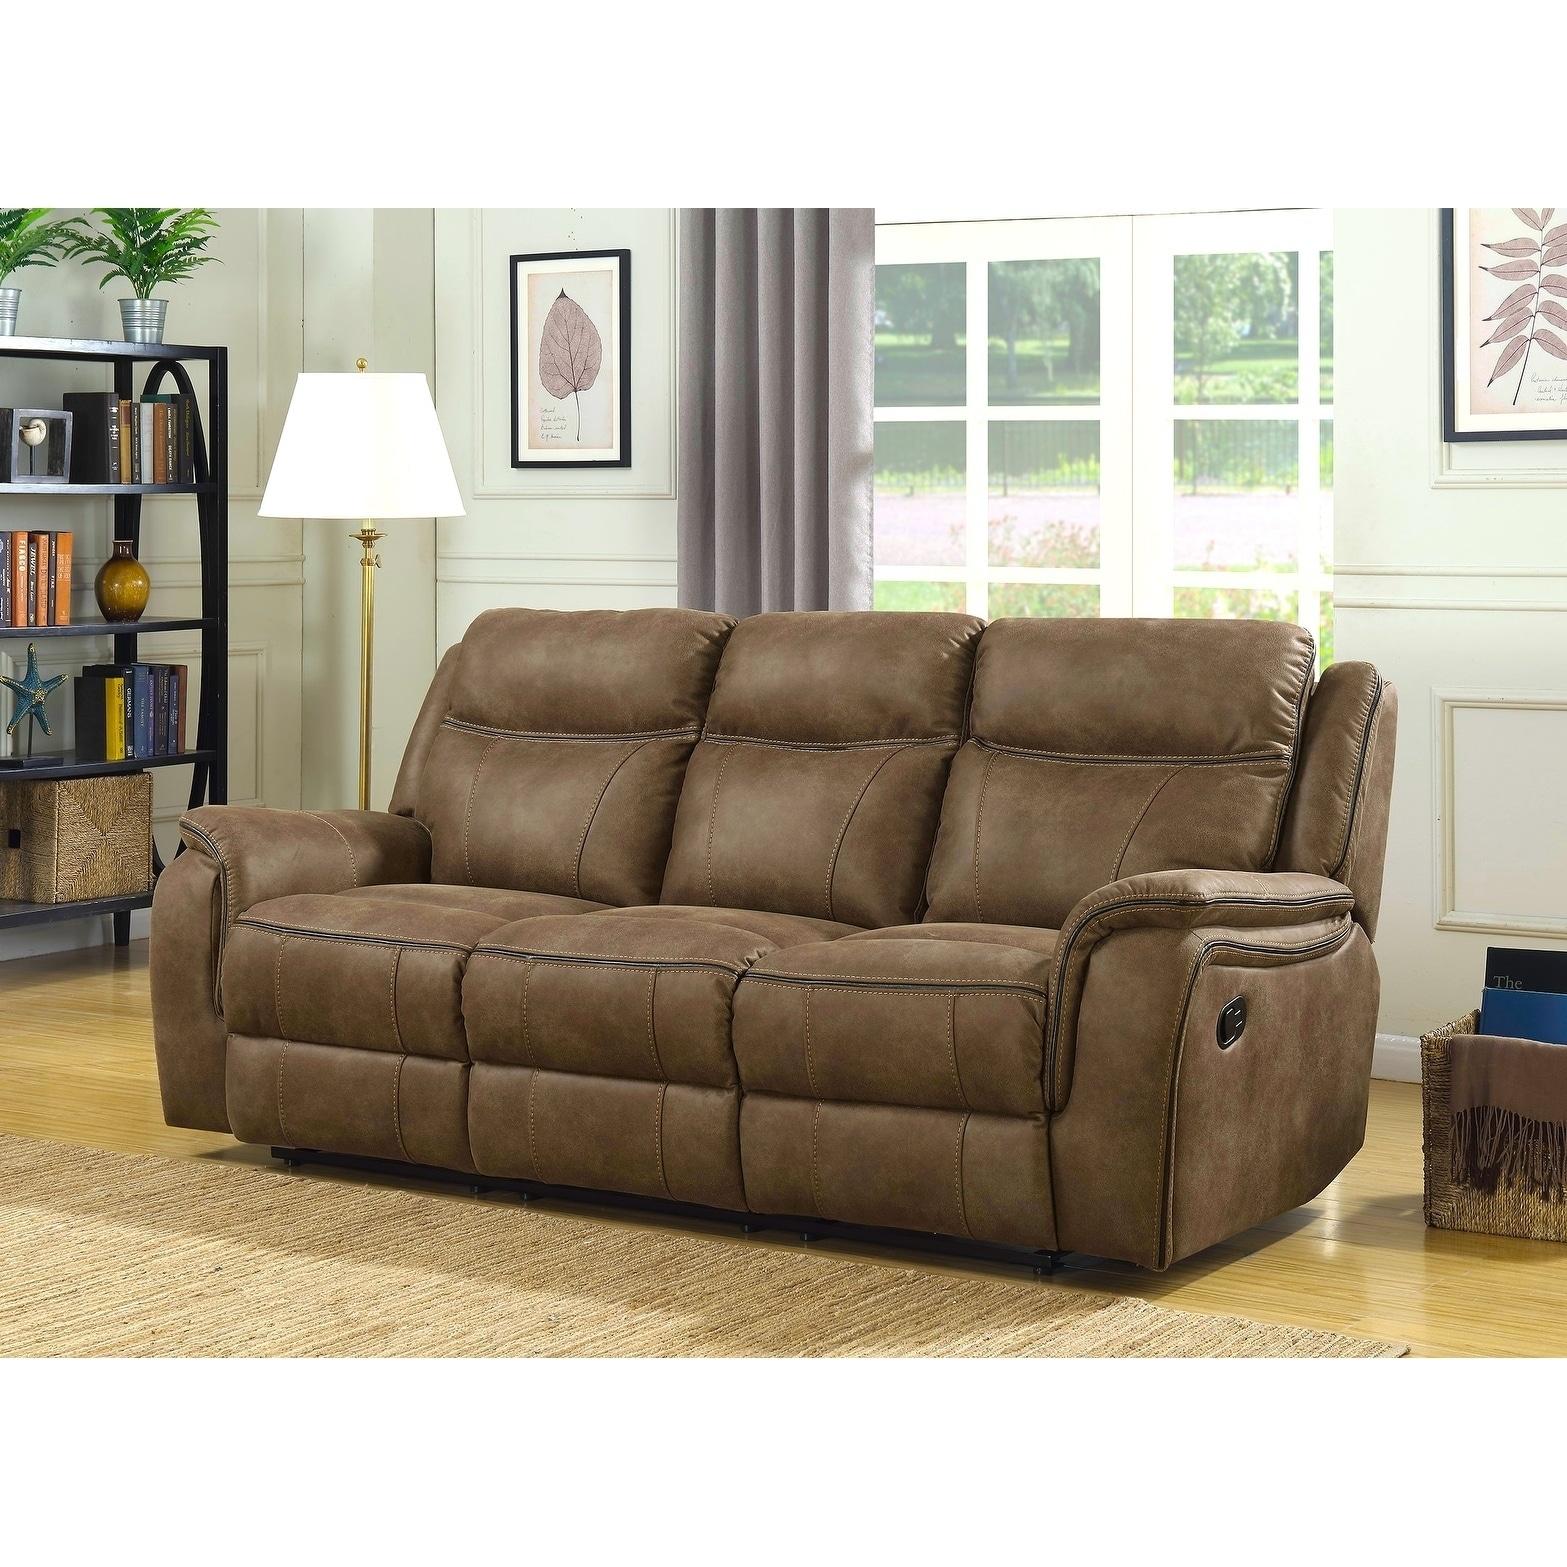 Shop MorriSofa Hudson Dual Lay Flat Reclining Sofa with Memory Foam ...